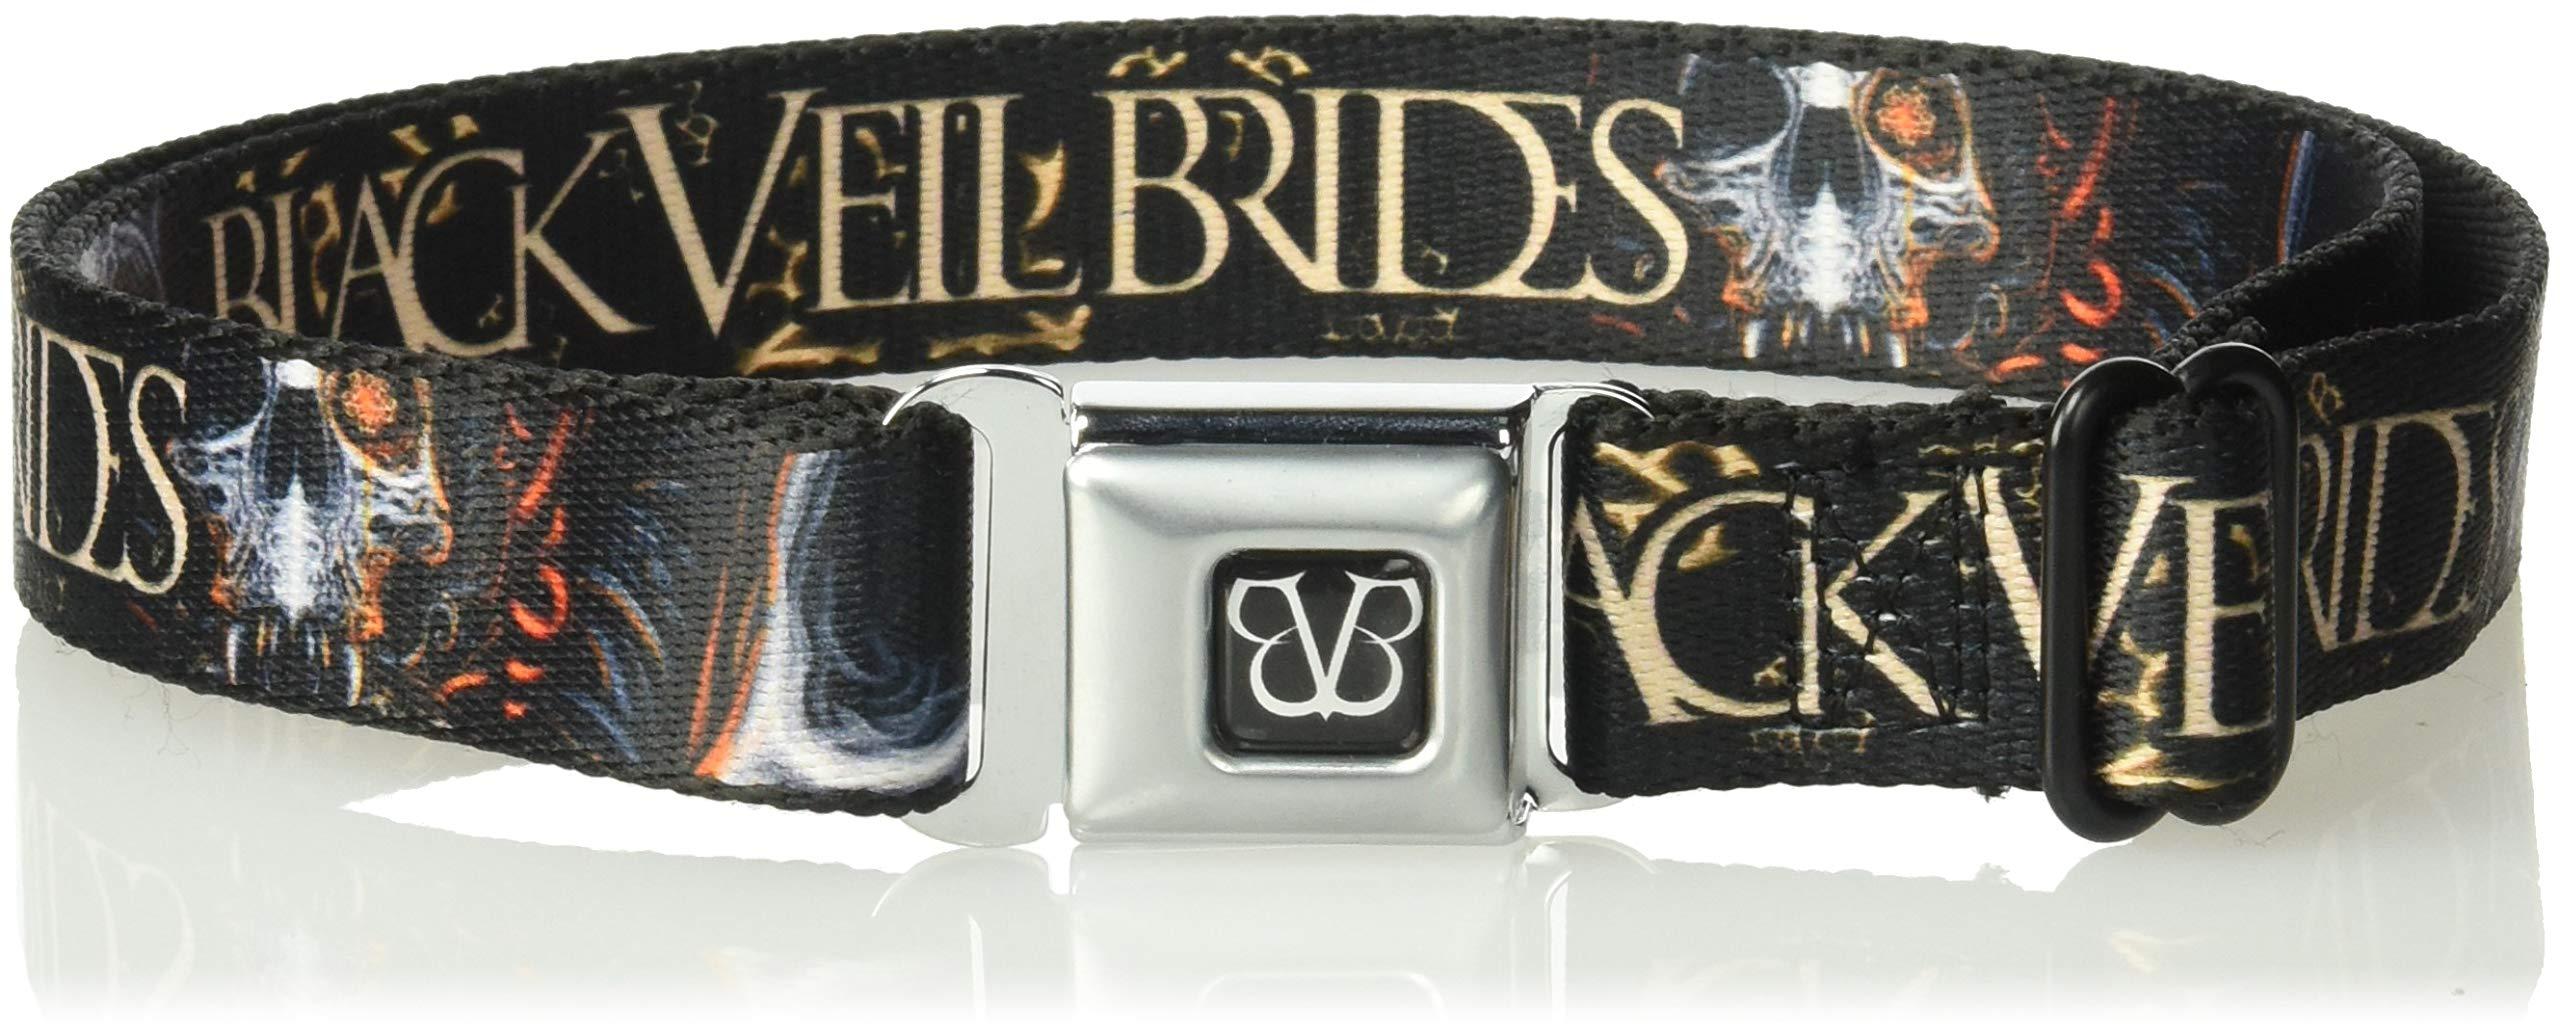 Buckle-Down Men's Seatbelt Belt Kids, Veil Brides Melting Skull Black/Grays/Orange/tan, 1.0'' Wide-20-36 Inches